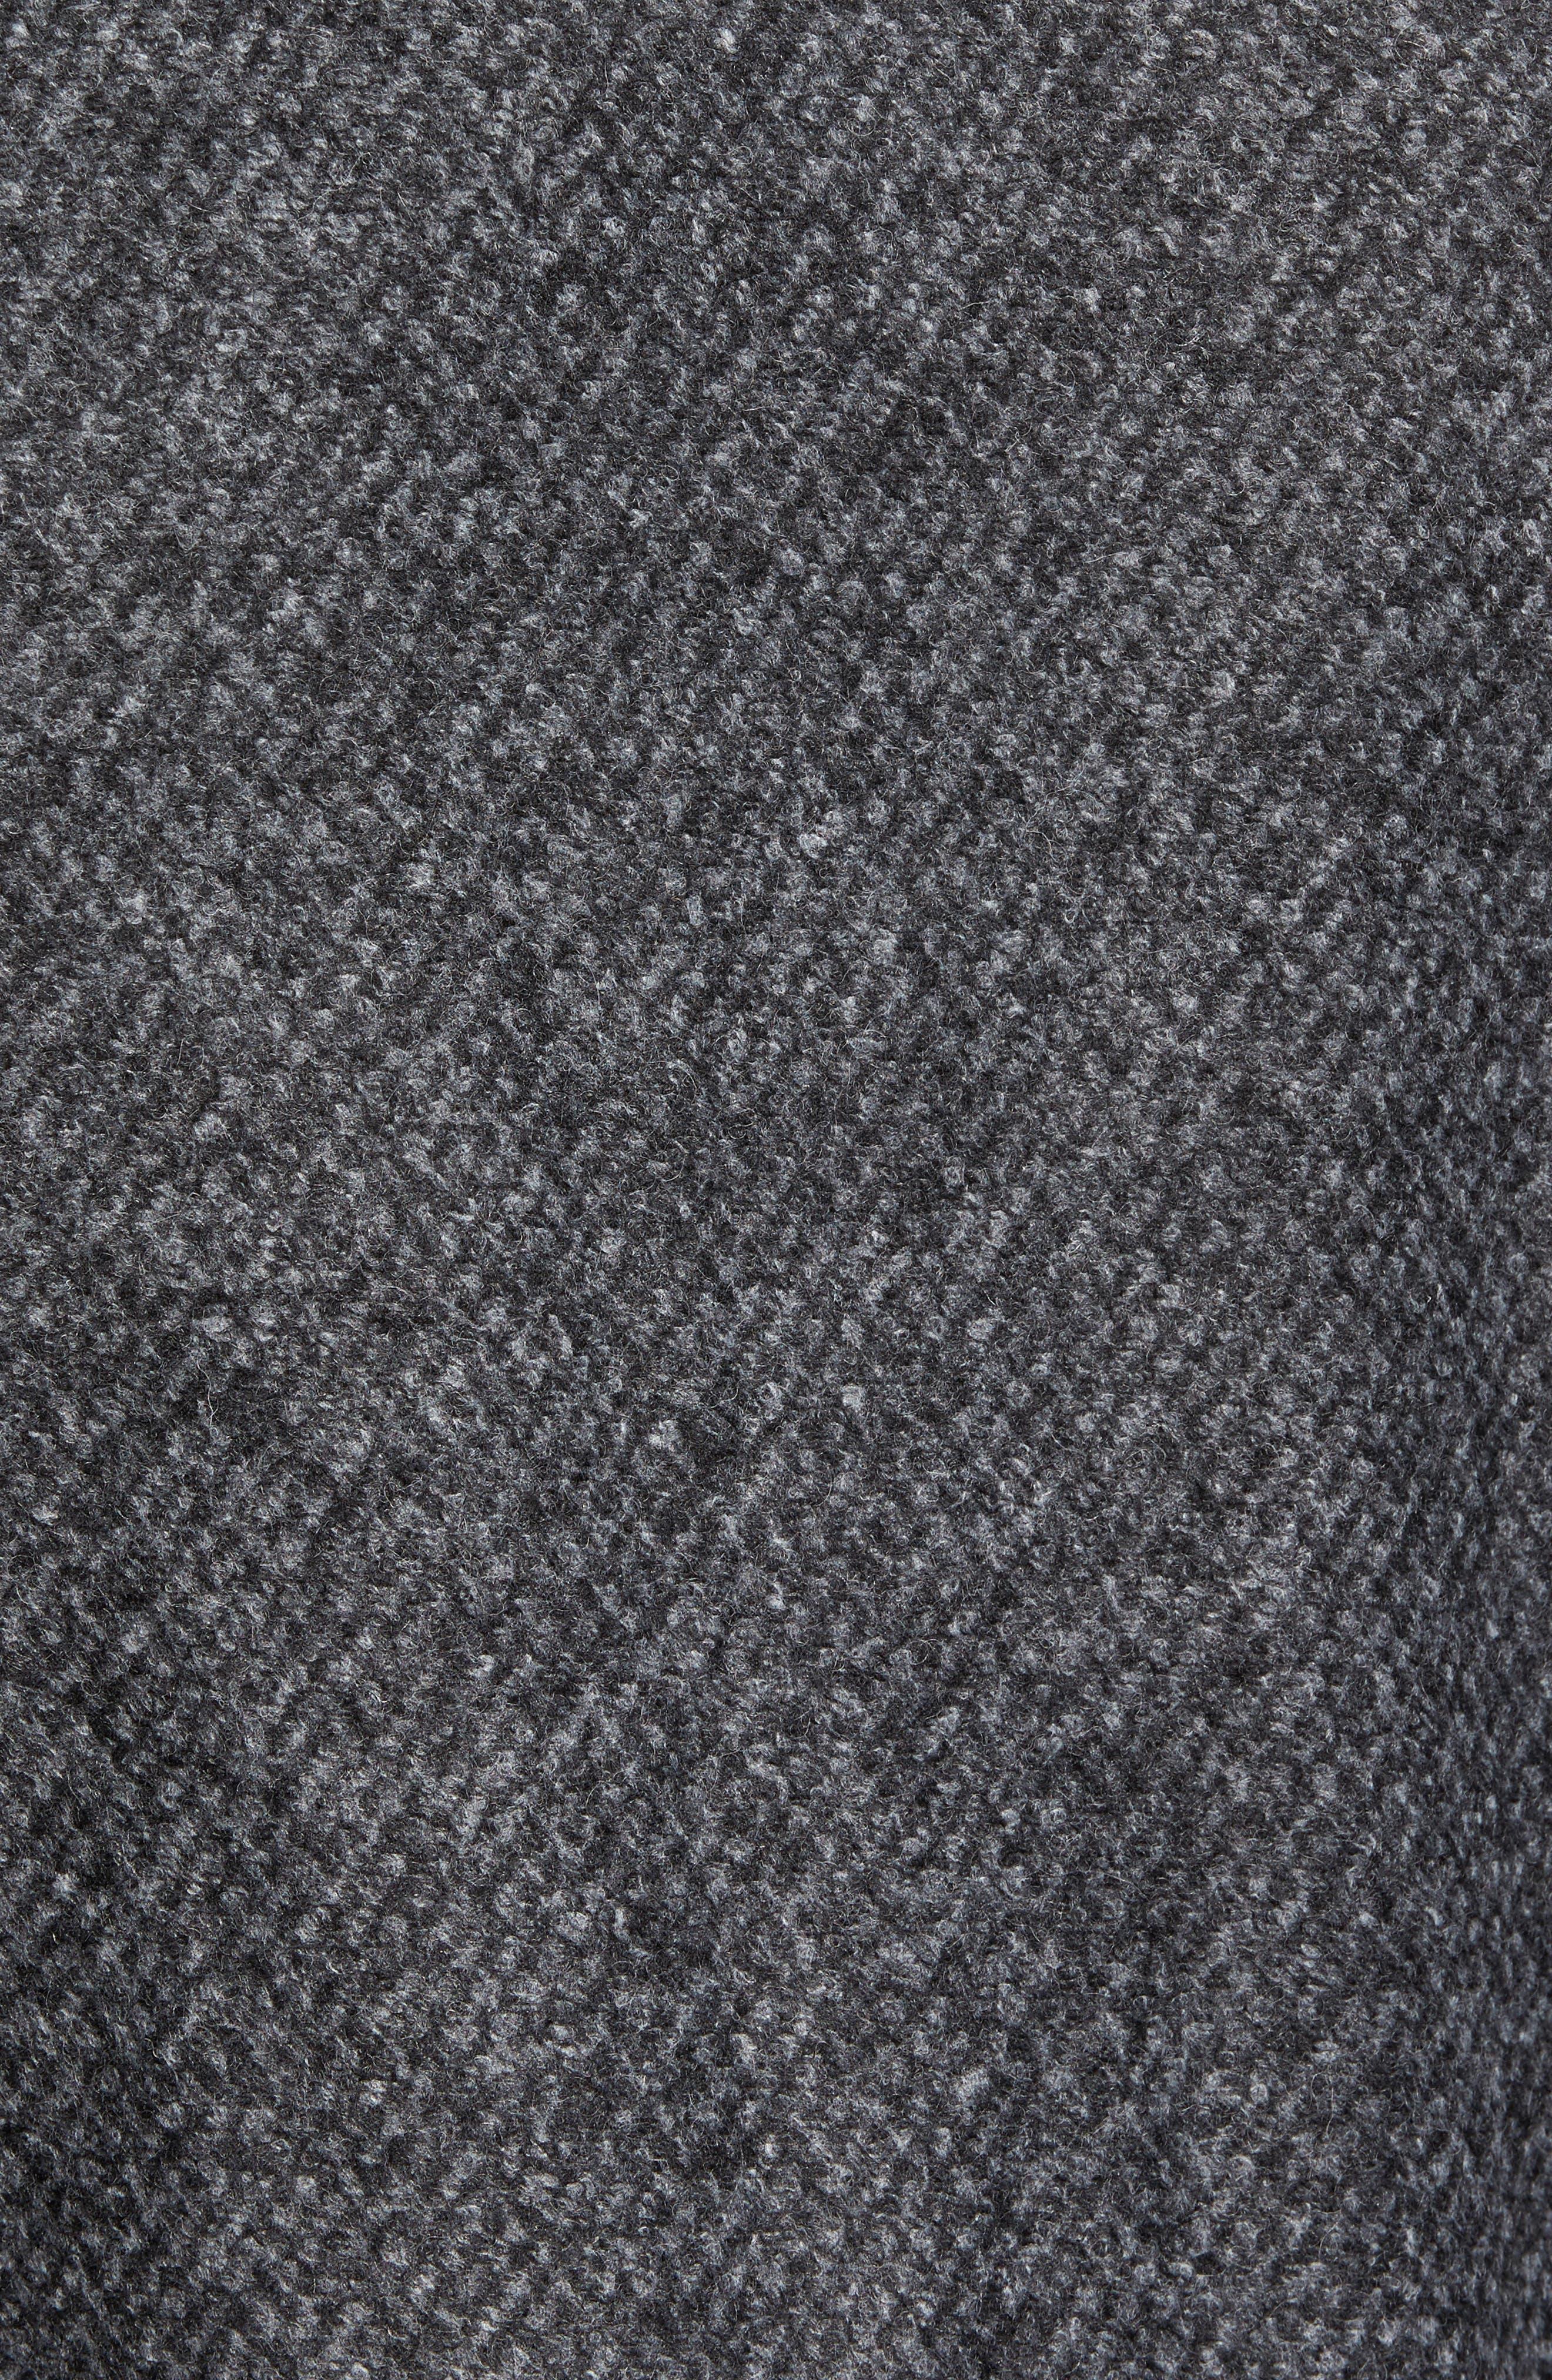 Salea Slim Fit Bomber Jacket,                             Alternate thumbnail 6, color,                             Grey